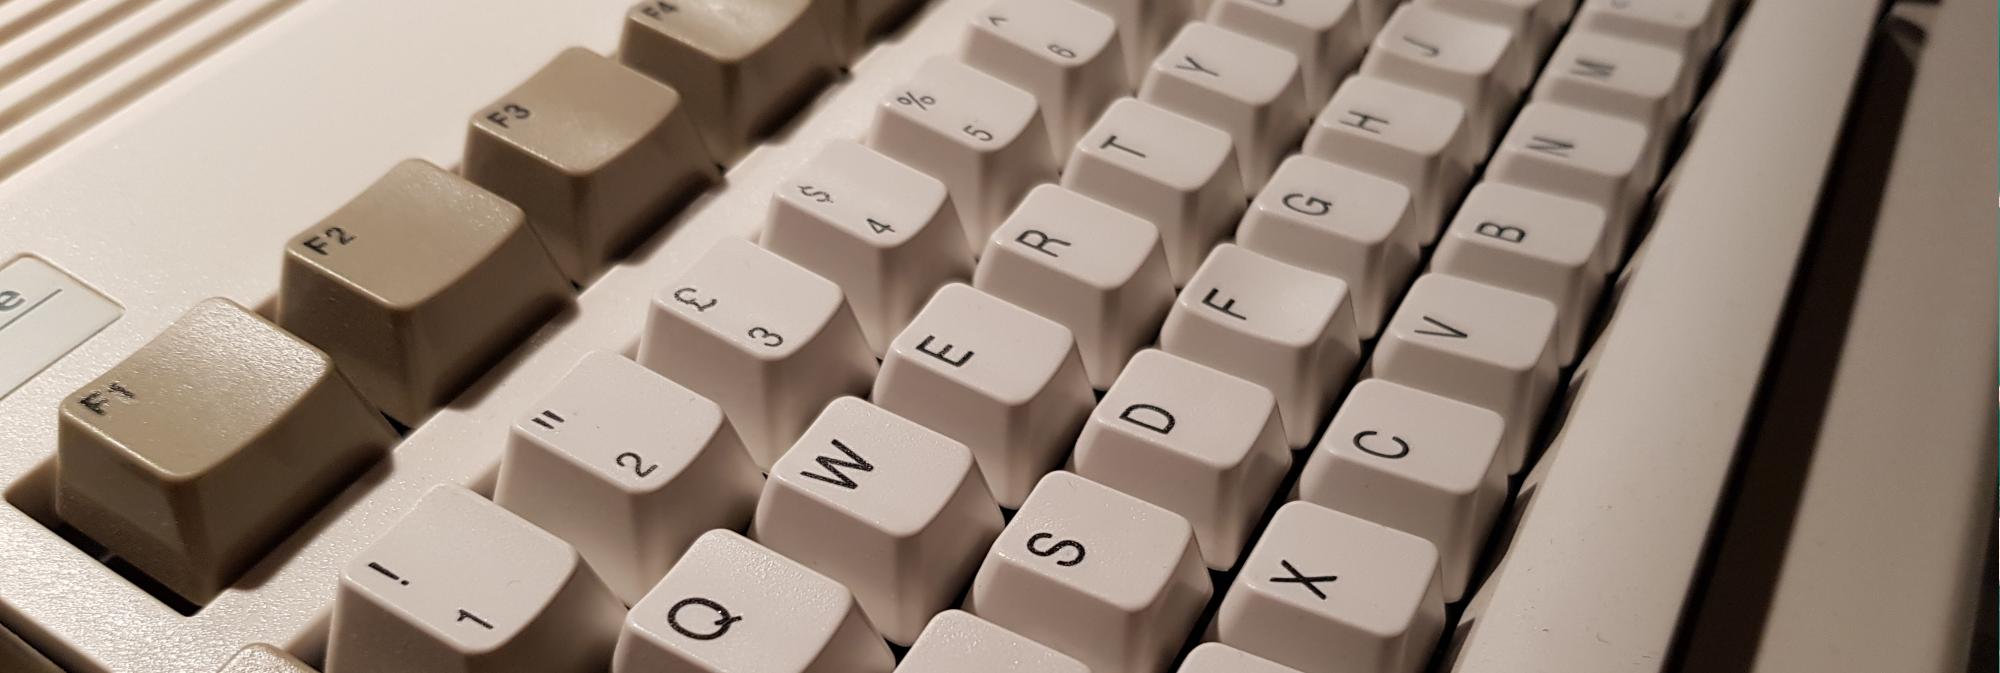 a1200_keyboard